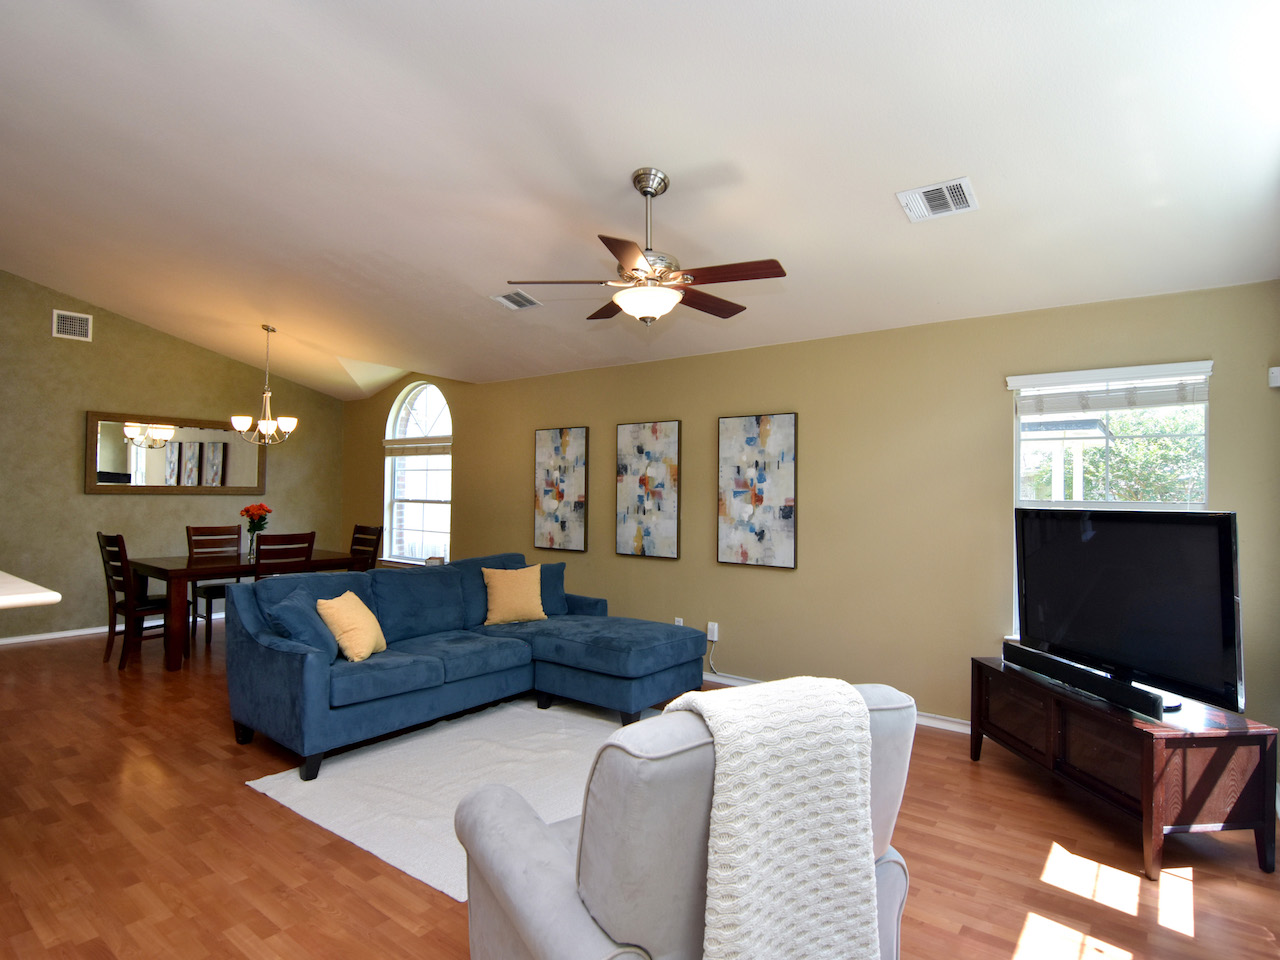 007_Living Room 2